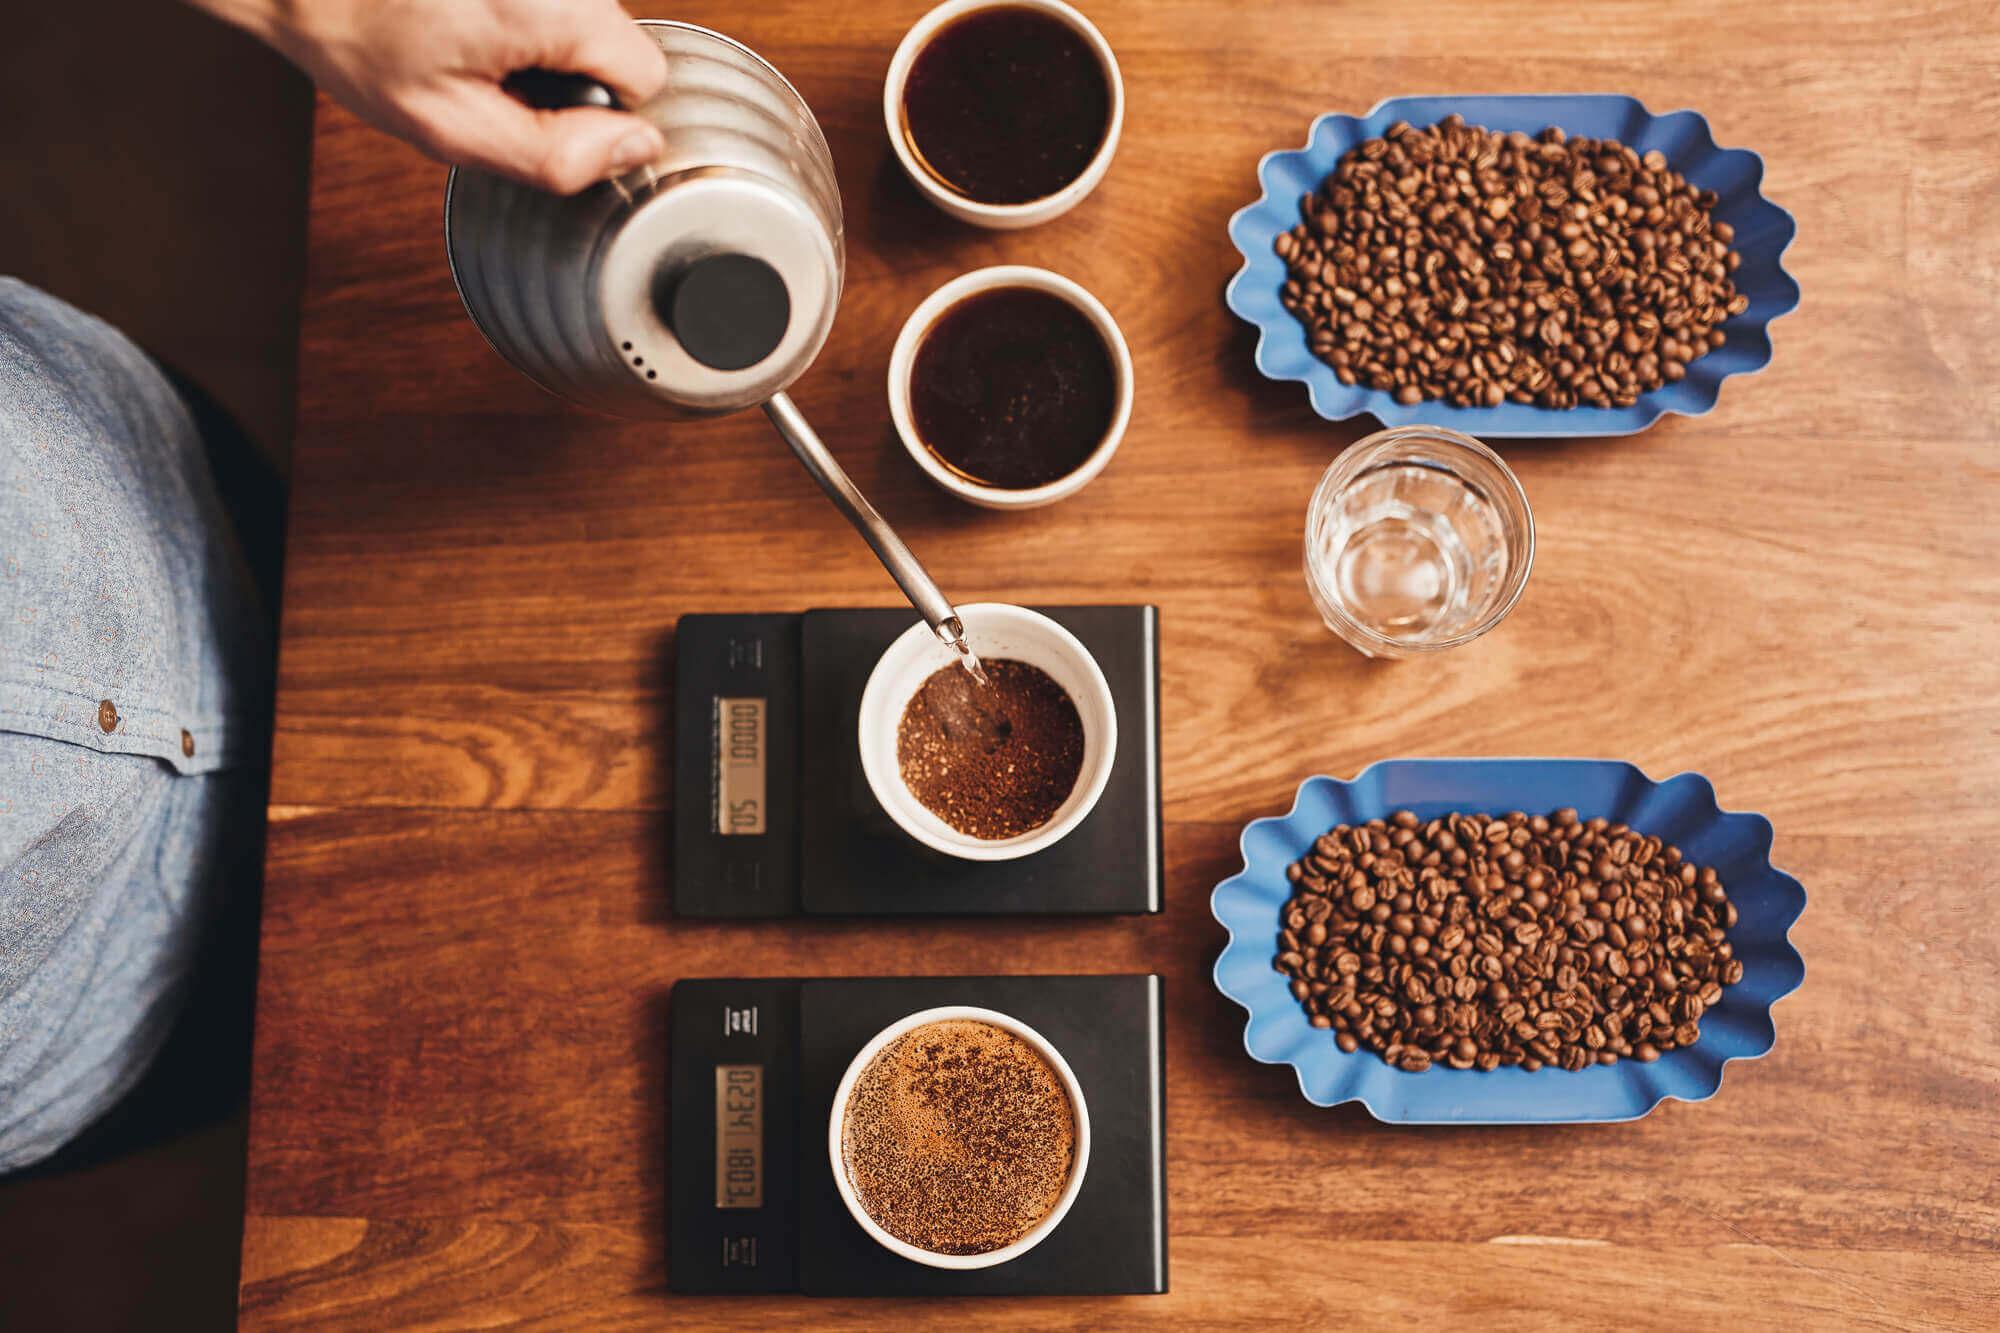 kaffee-roesterei-cham